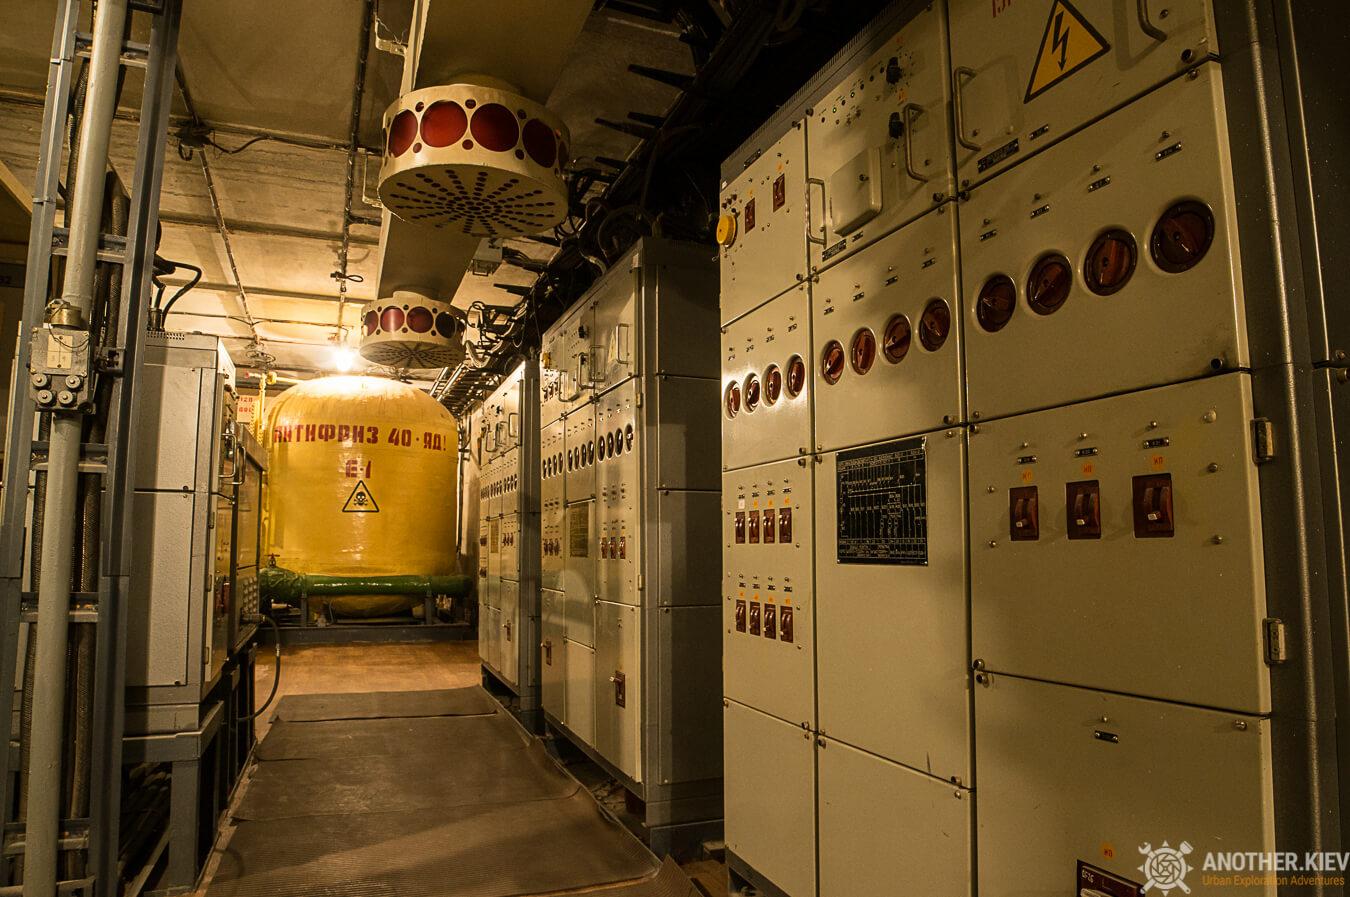 Missilo-6249 Missile Base Tour